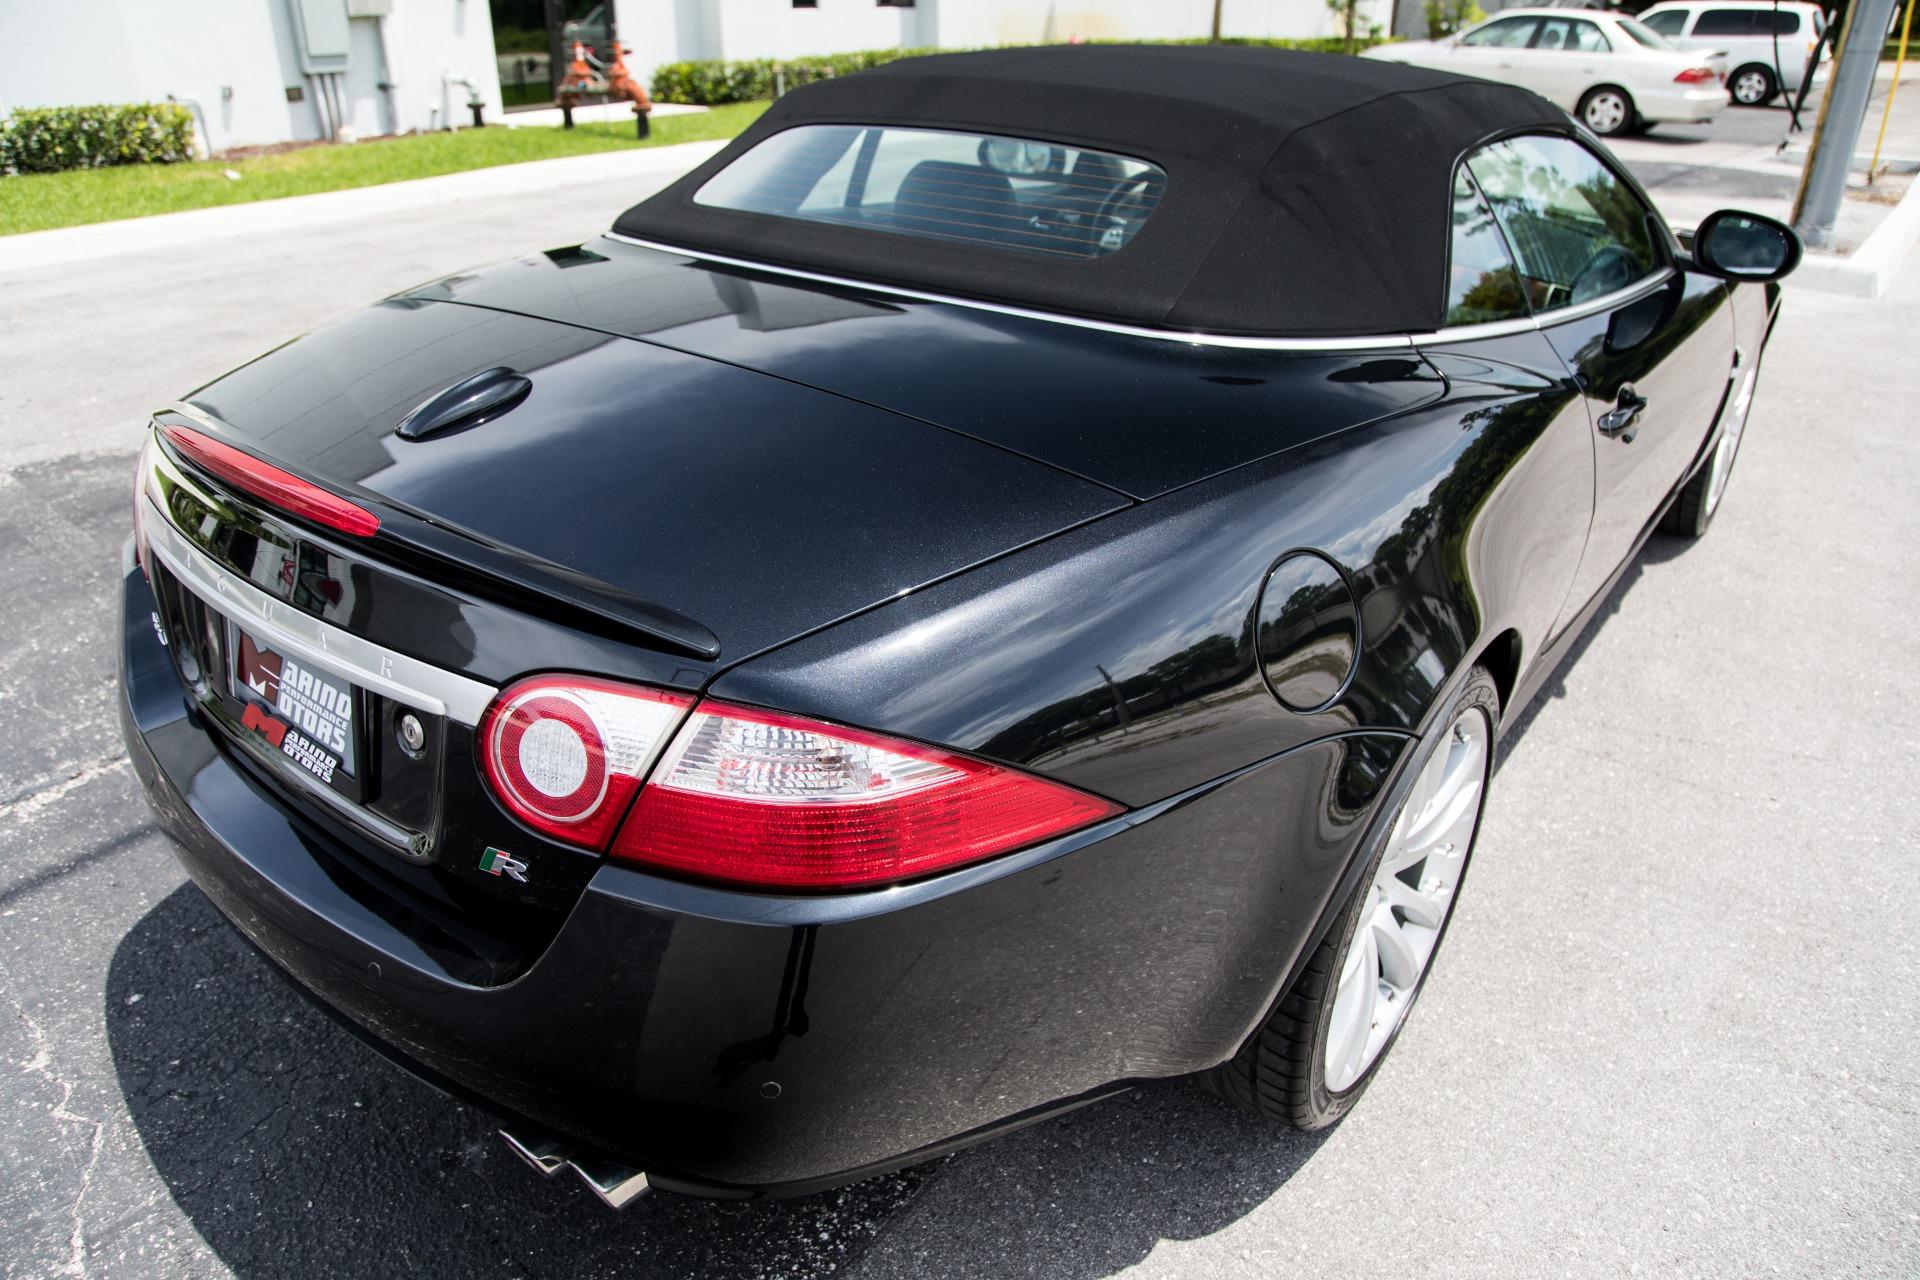 Used 2008 Jaguar XK-Series XKR For Sale ($32,900)   Marino Performance Motors Stock #B24841